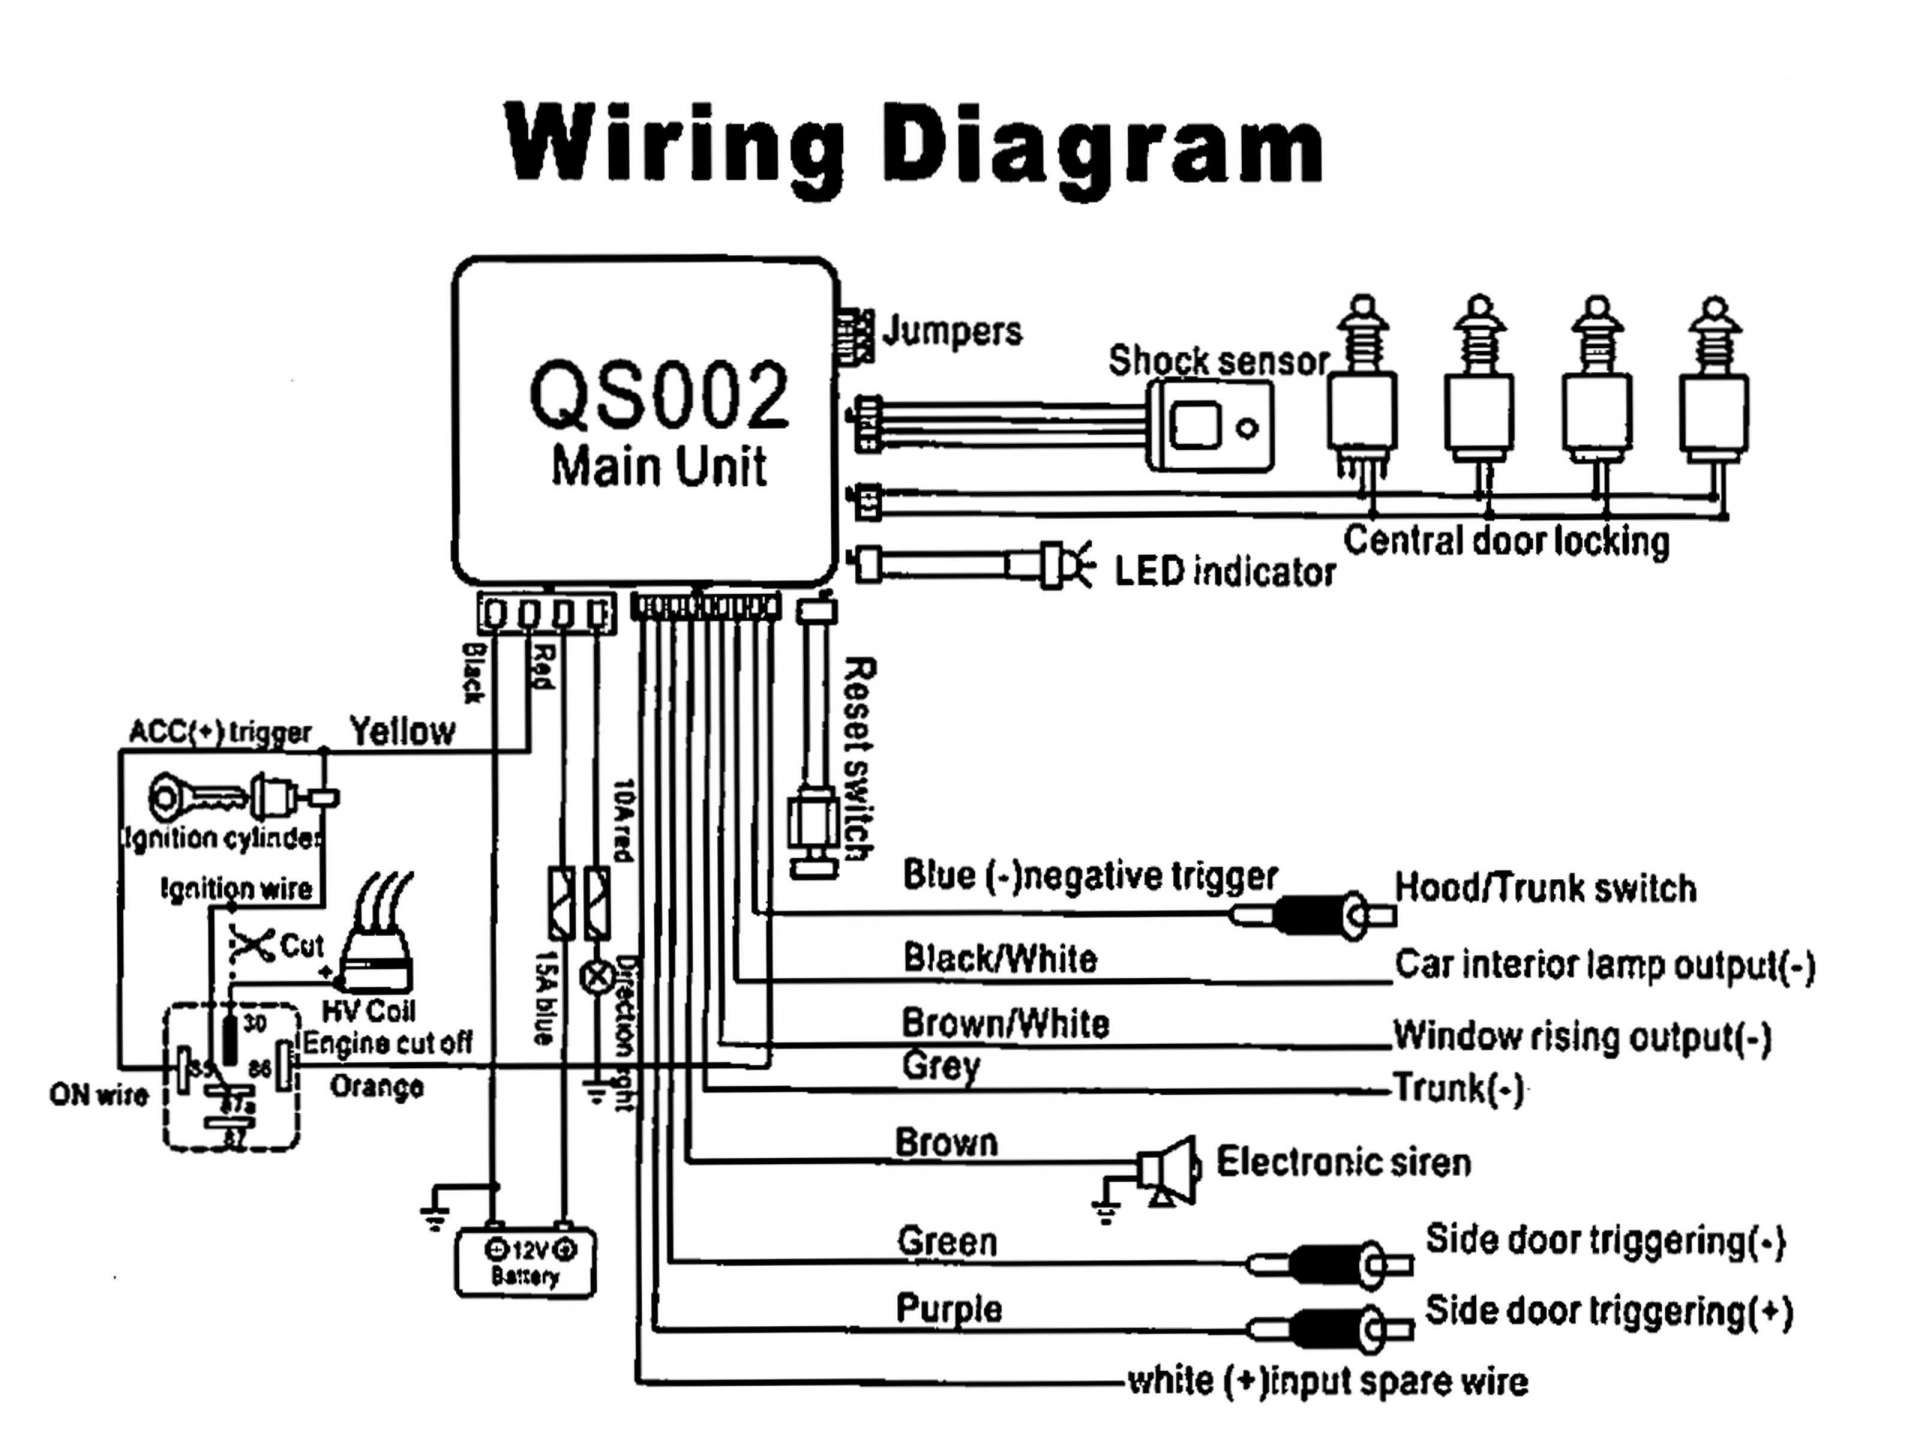 15 Silencer Car Alarm Wiring Diagram Car Diagram In 2020 Car